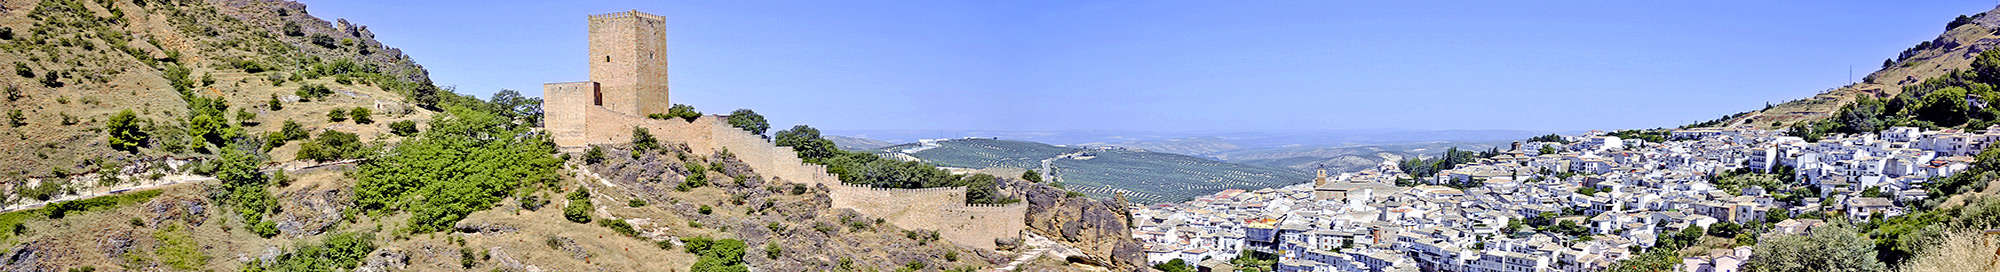 Week-end et séjour Jaén